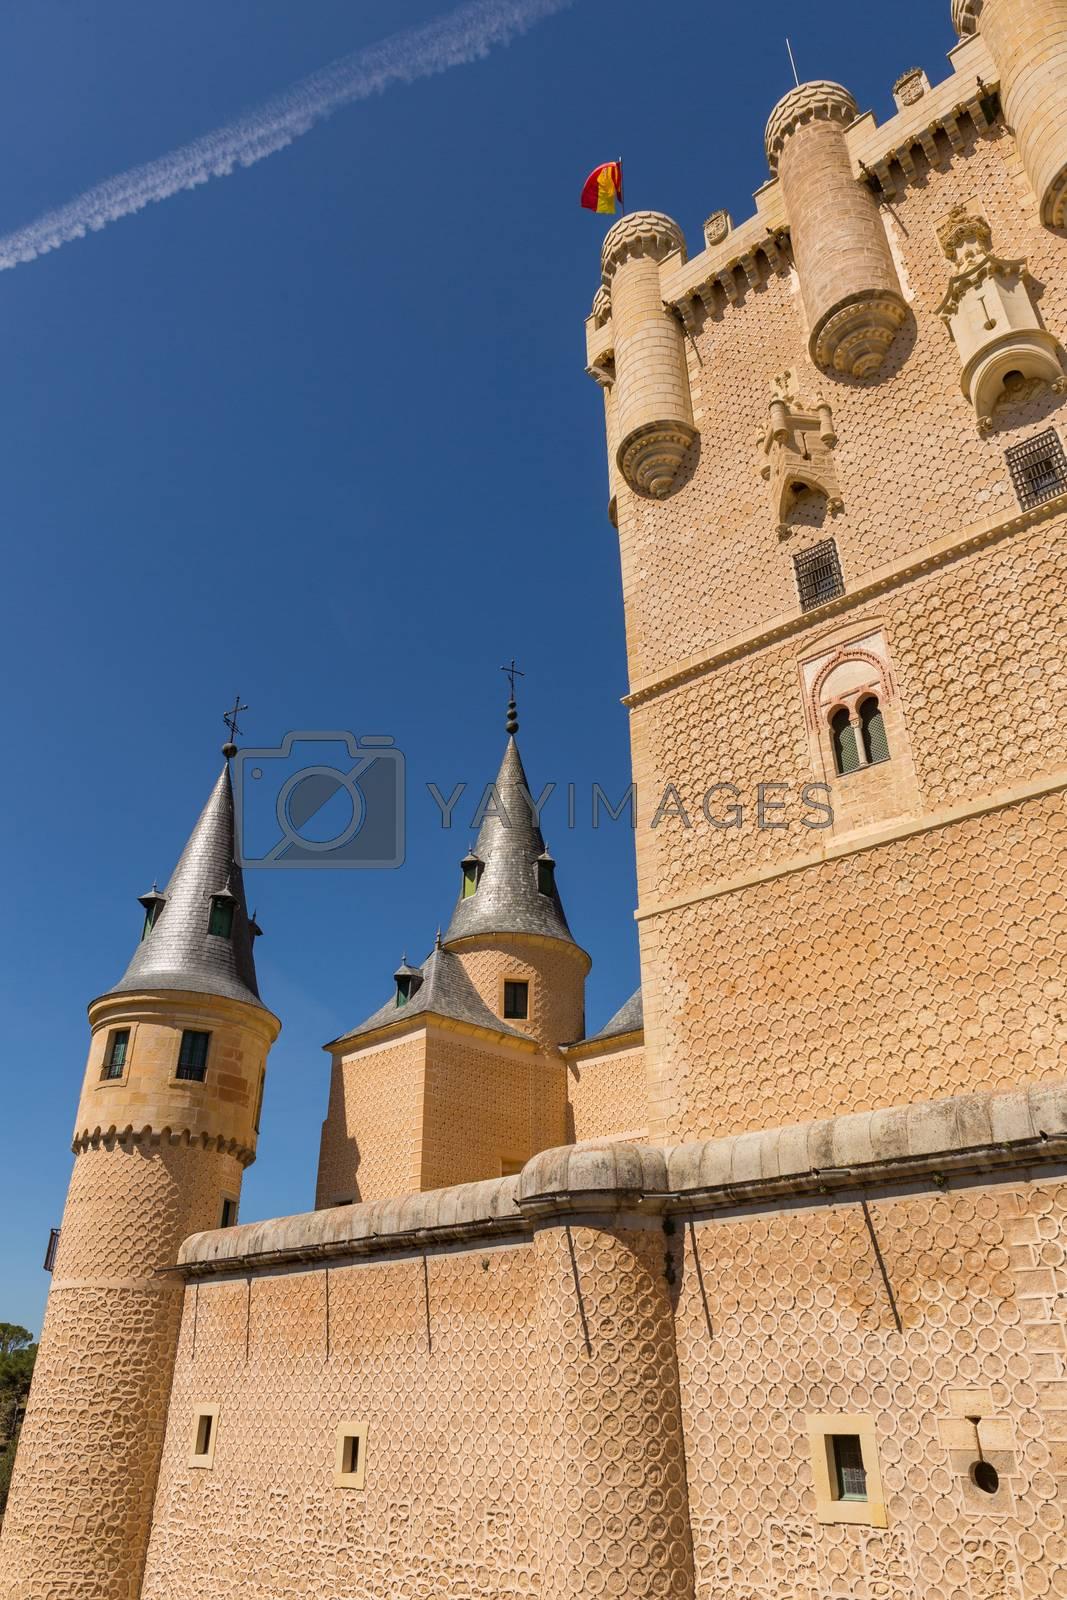 Details of the famous Alcazar castle of Segovia, Castilla y Leon, Spain